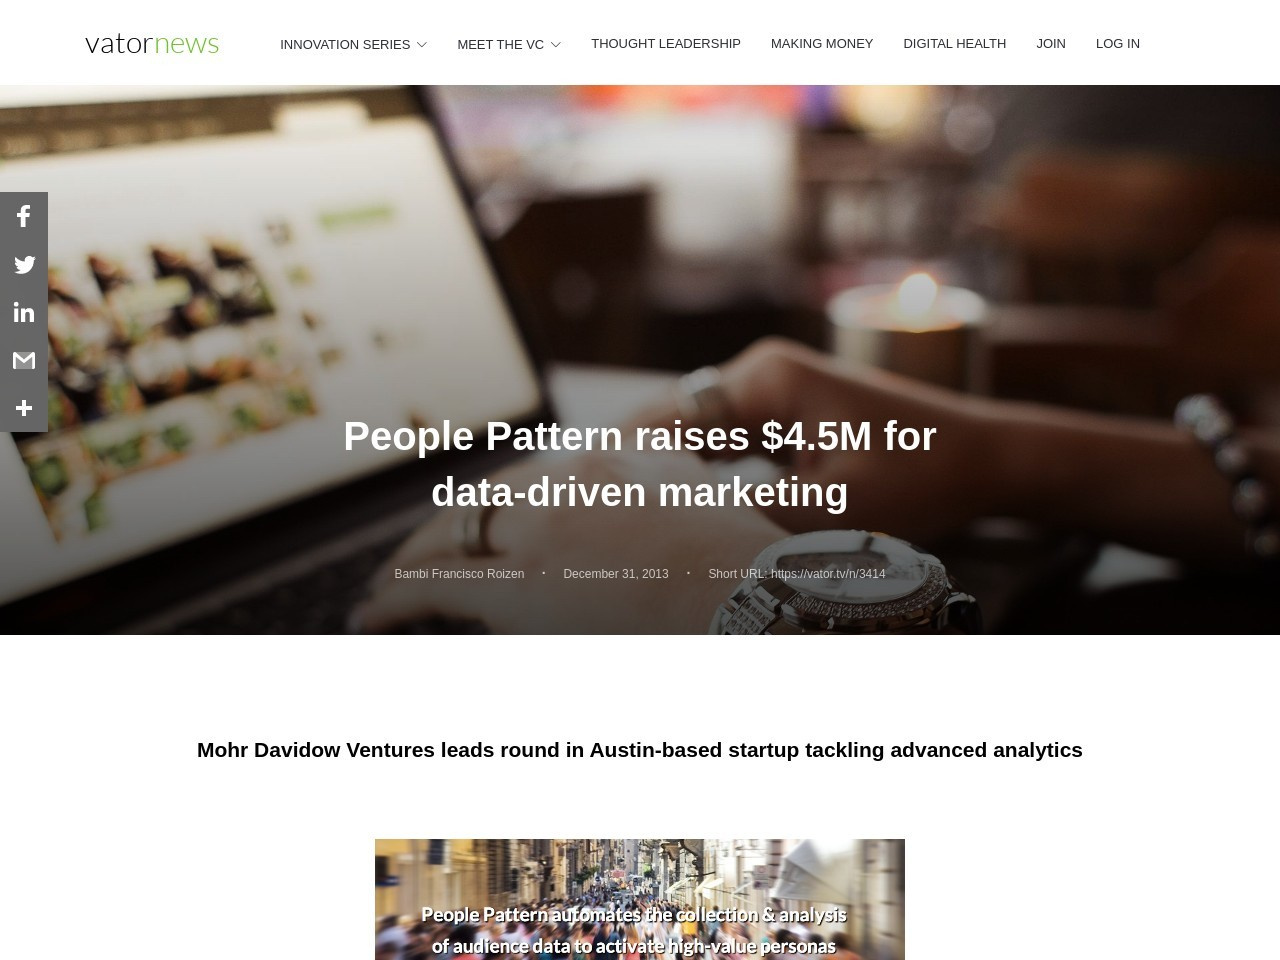 People Pattern raises $4.5M for data-driven marketing